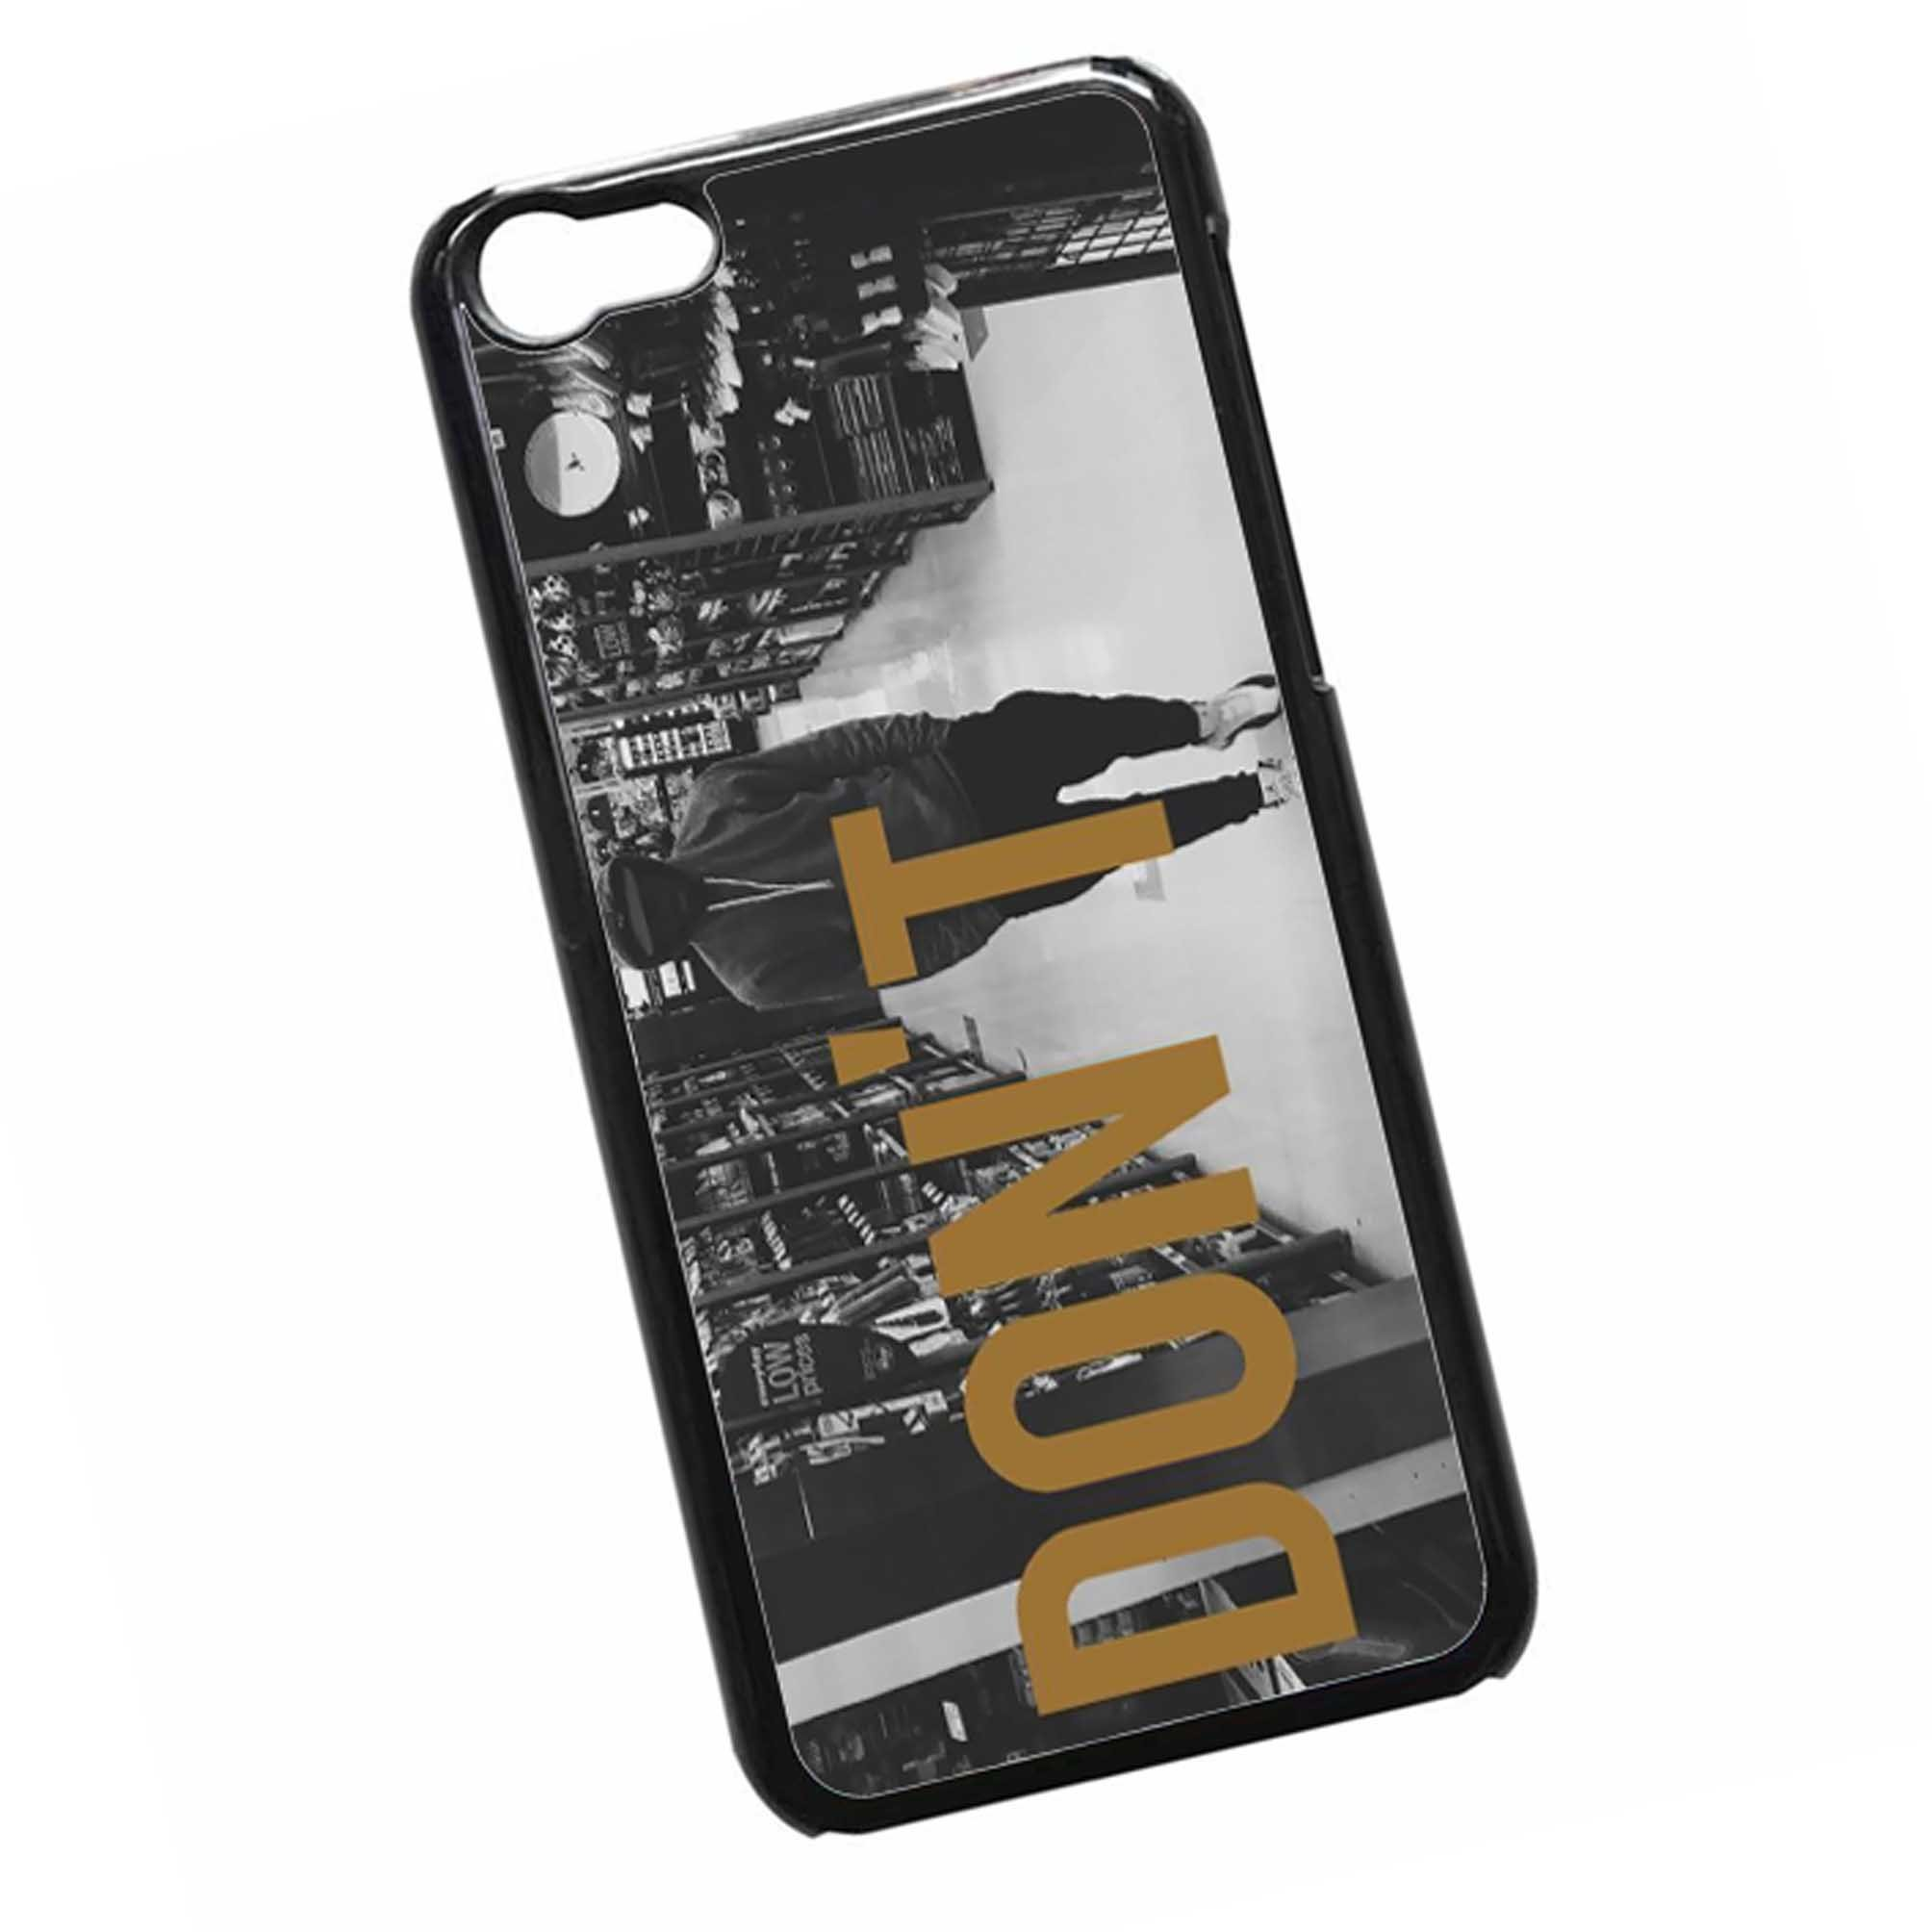 Bryzon tiller dont For iPhone 5C Case Cover